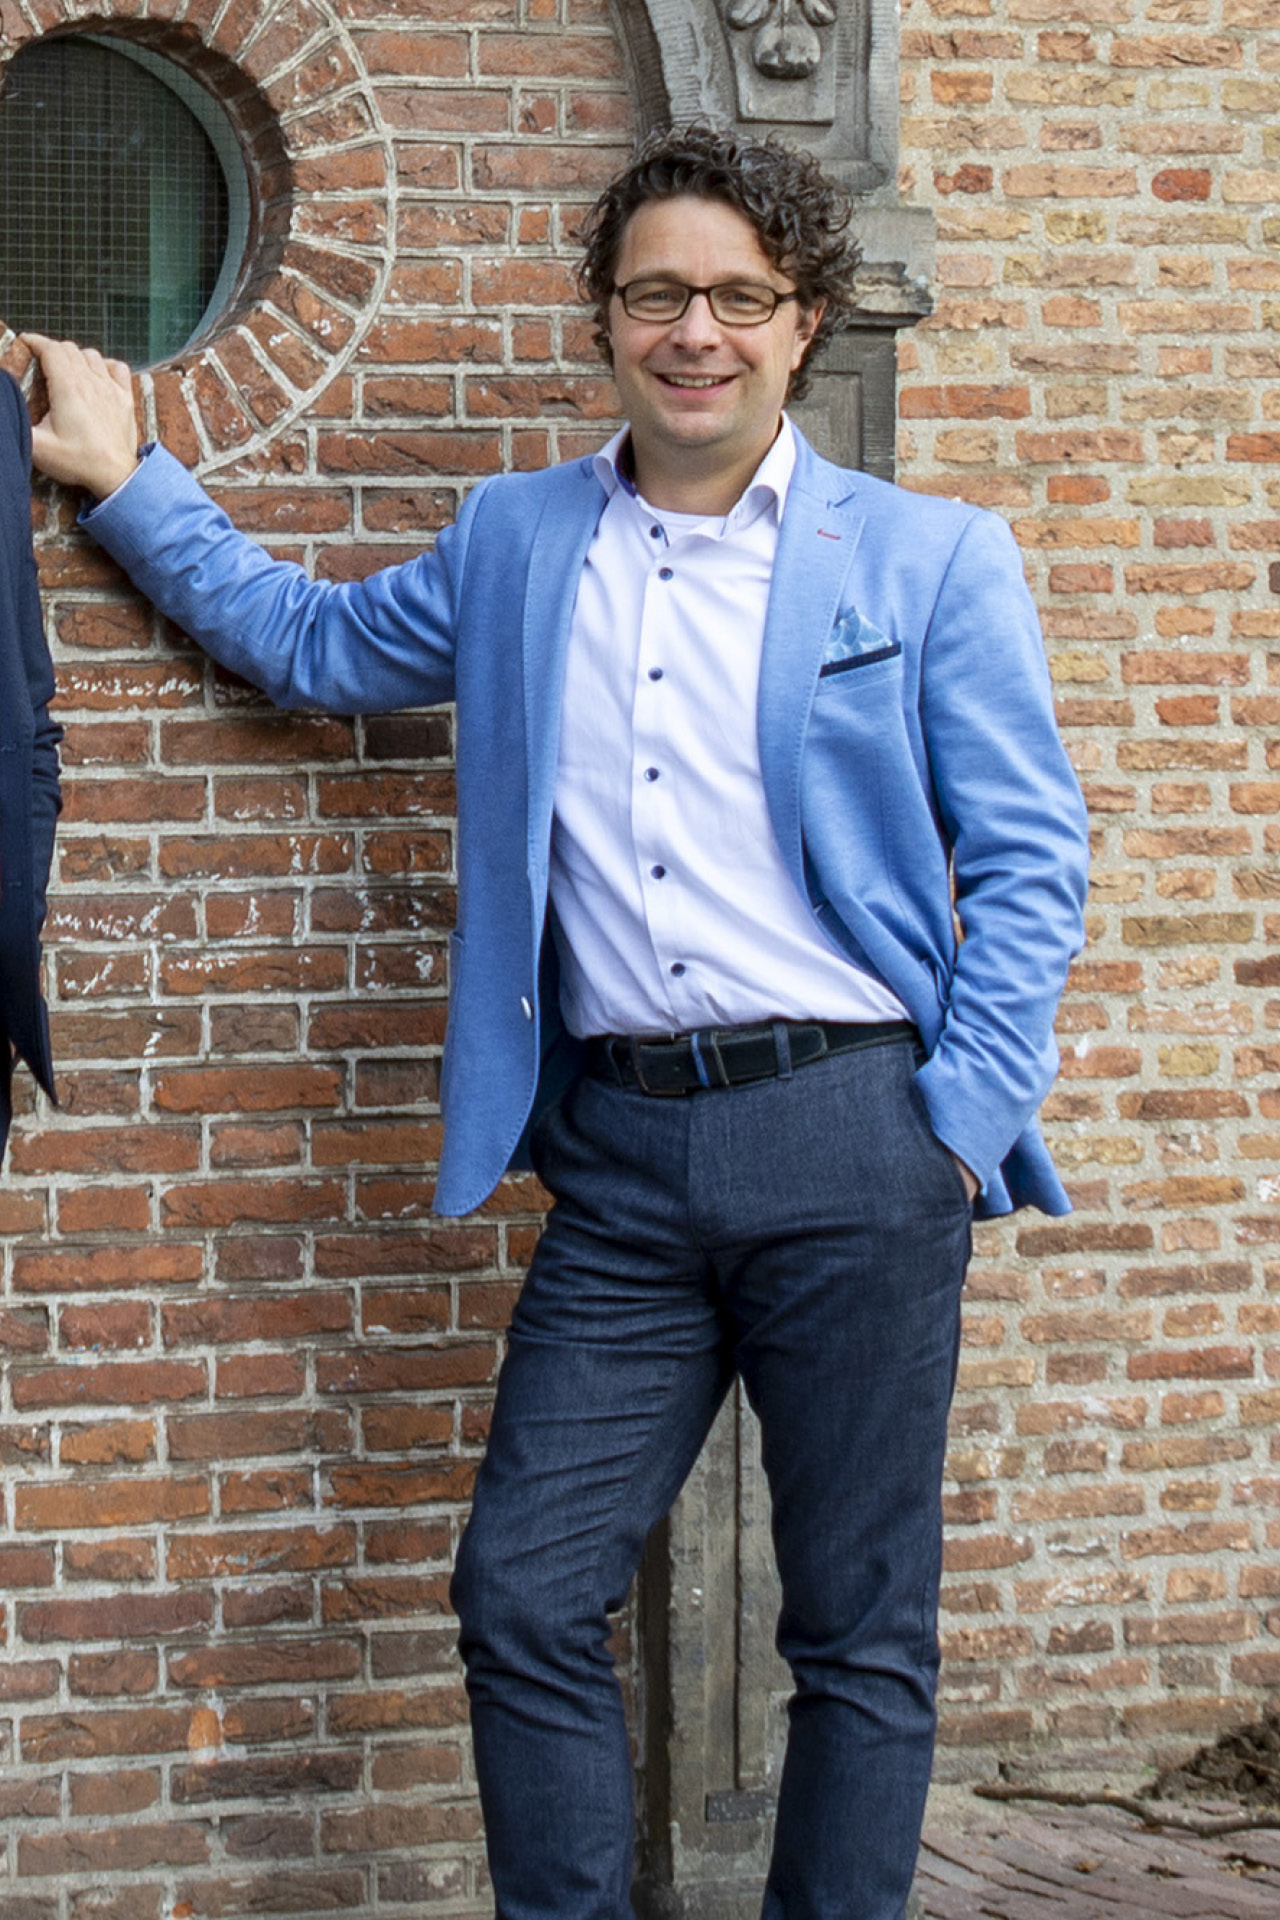 Martijn Verbeek Wolthuys